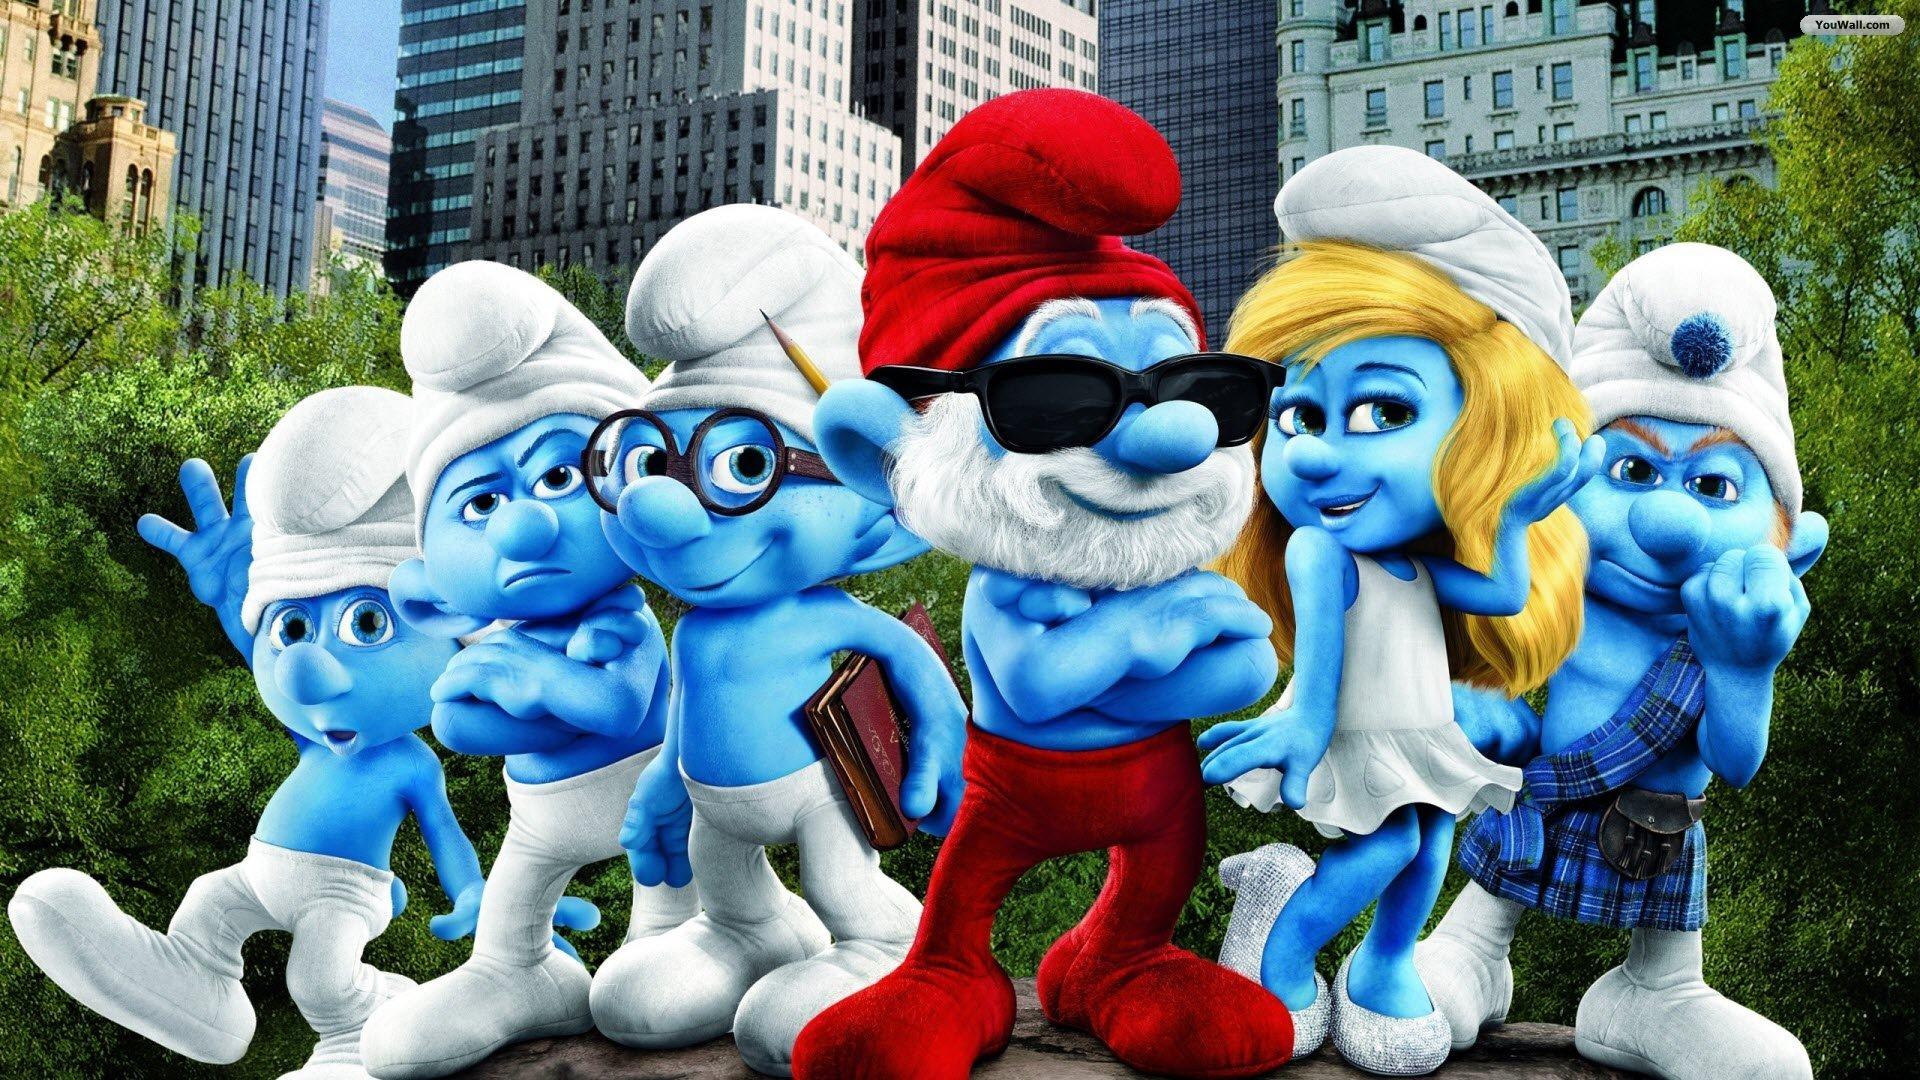 Smurfs Pics, Cartoon Collection